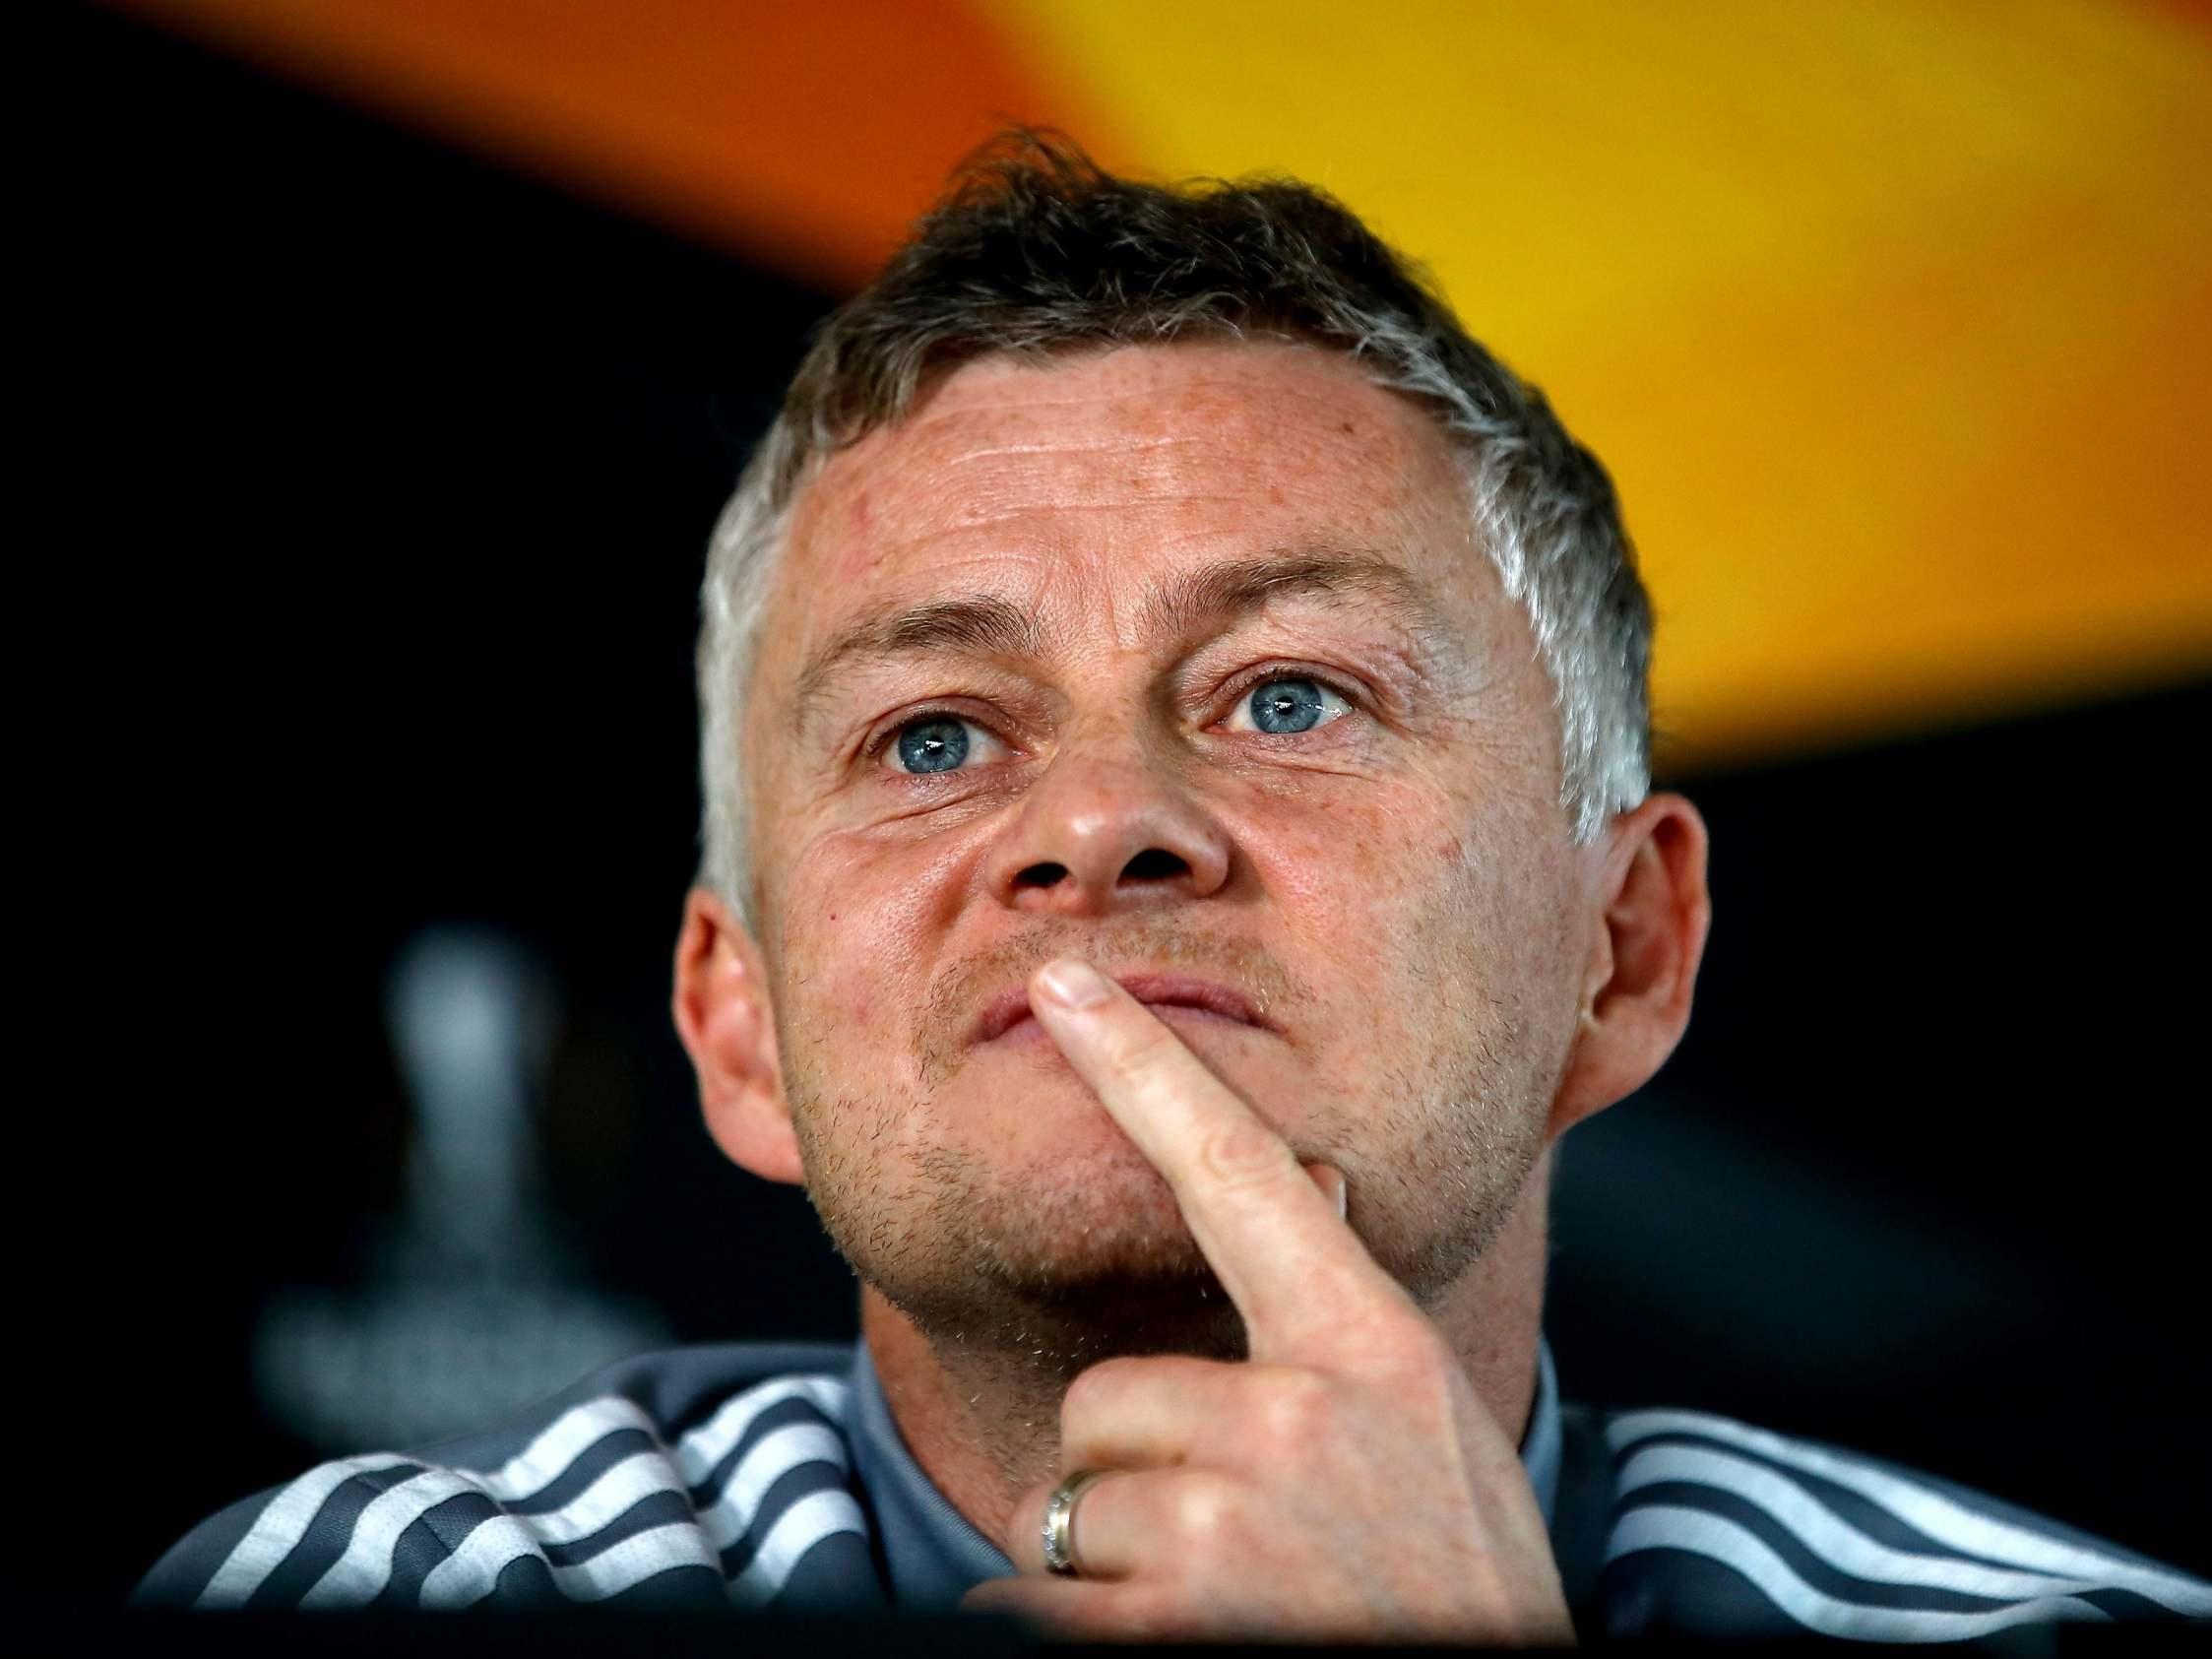 Ole Gunnar Solskjaer wants maximum points to send Manchester United into Champions League spots thumbnail